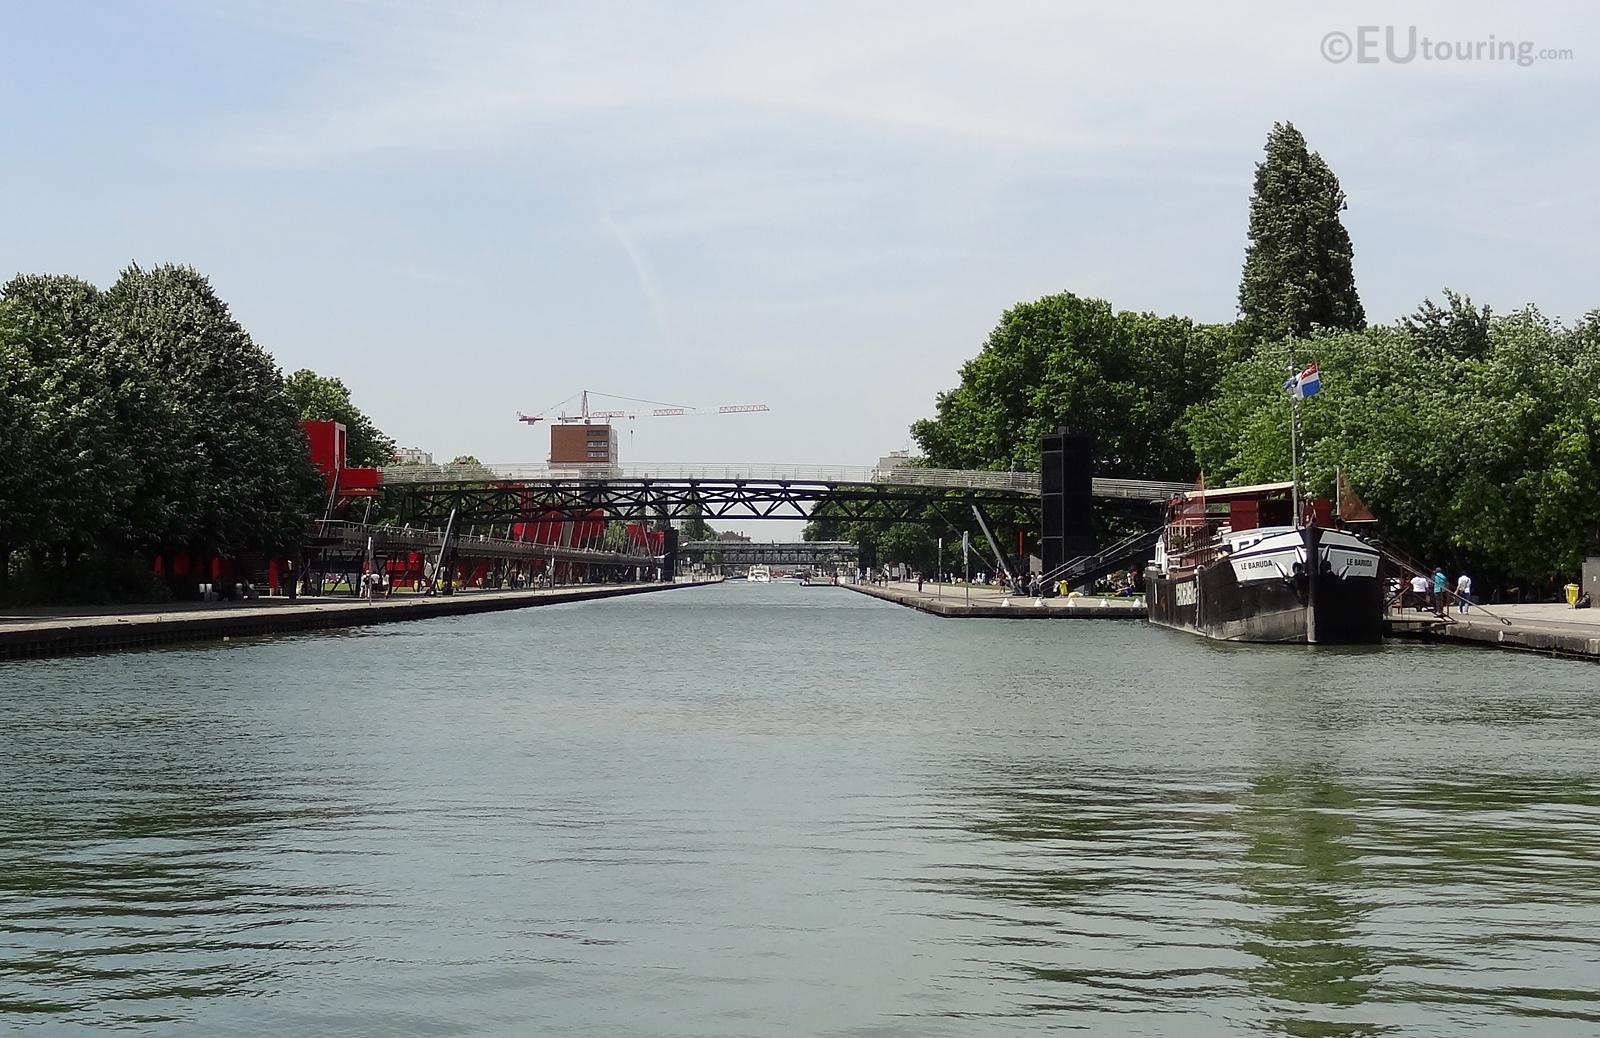 Canal de l'Ourcq and Peniche Cinema